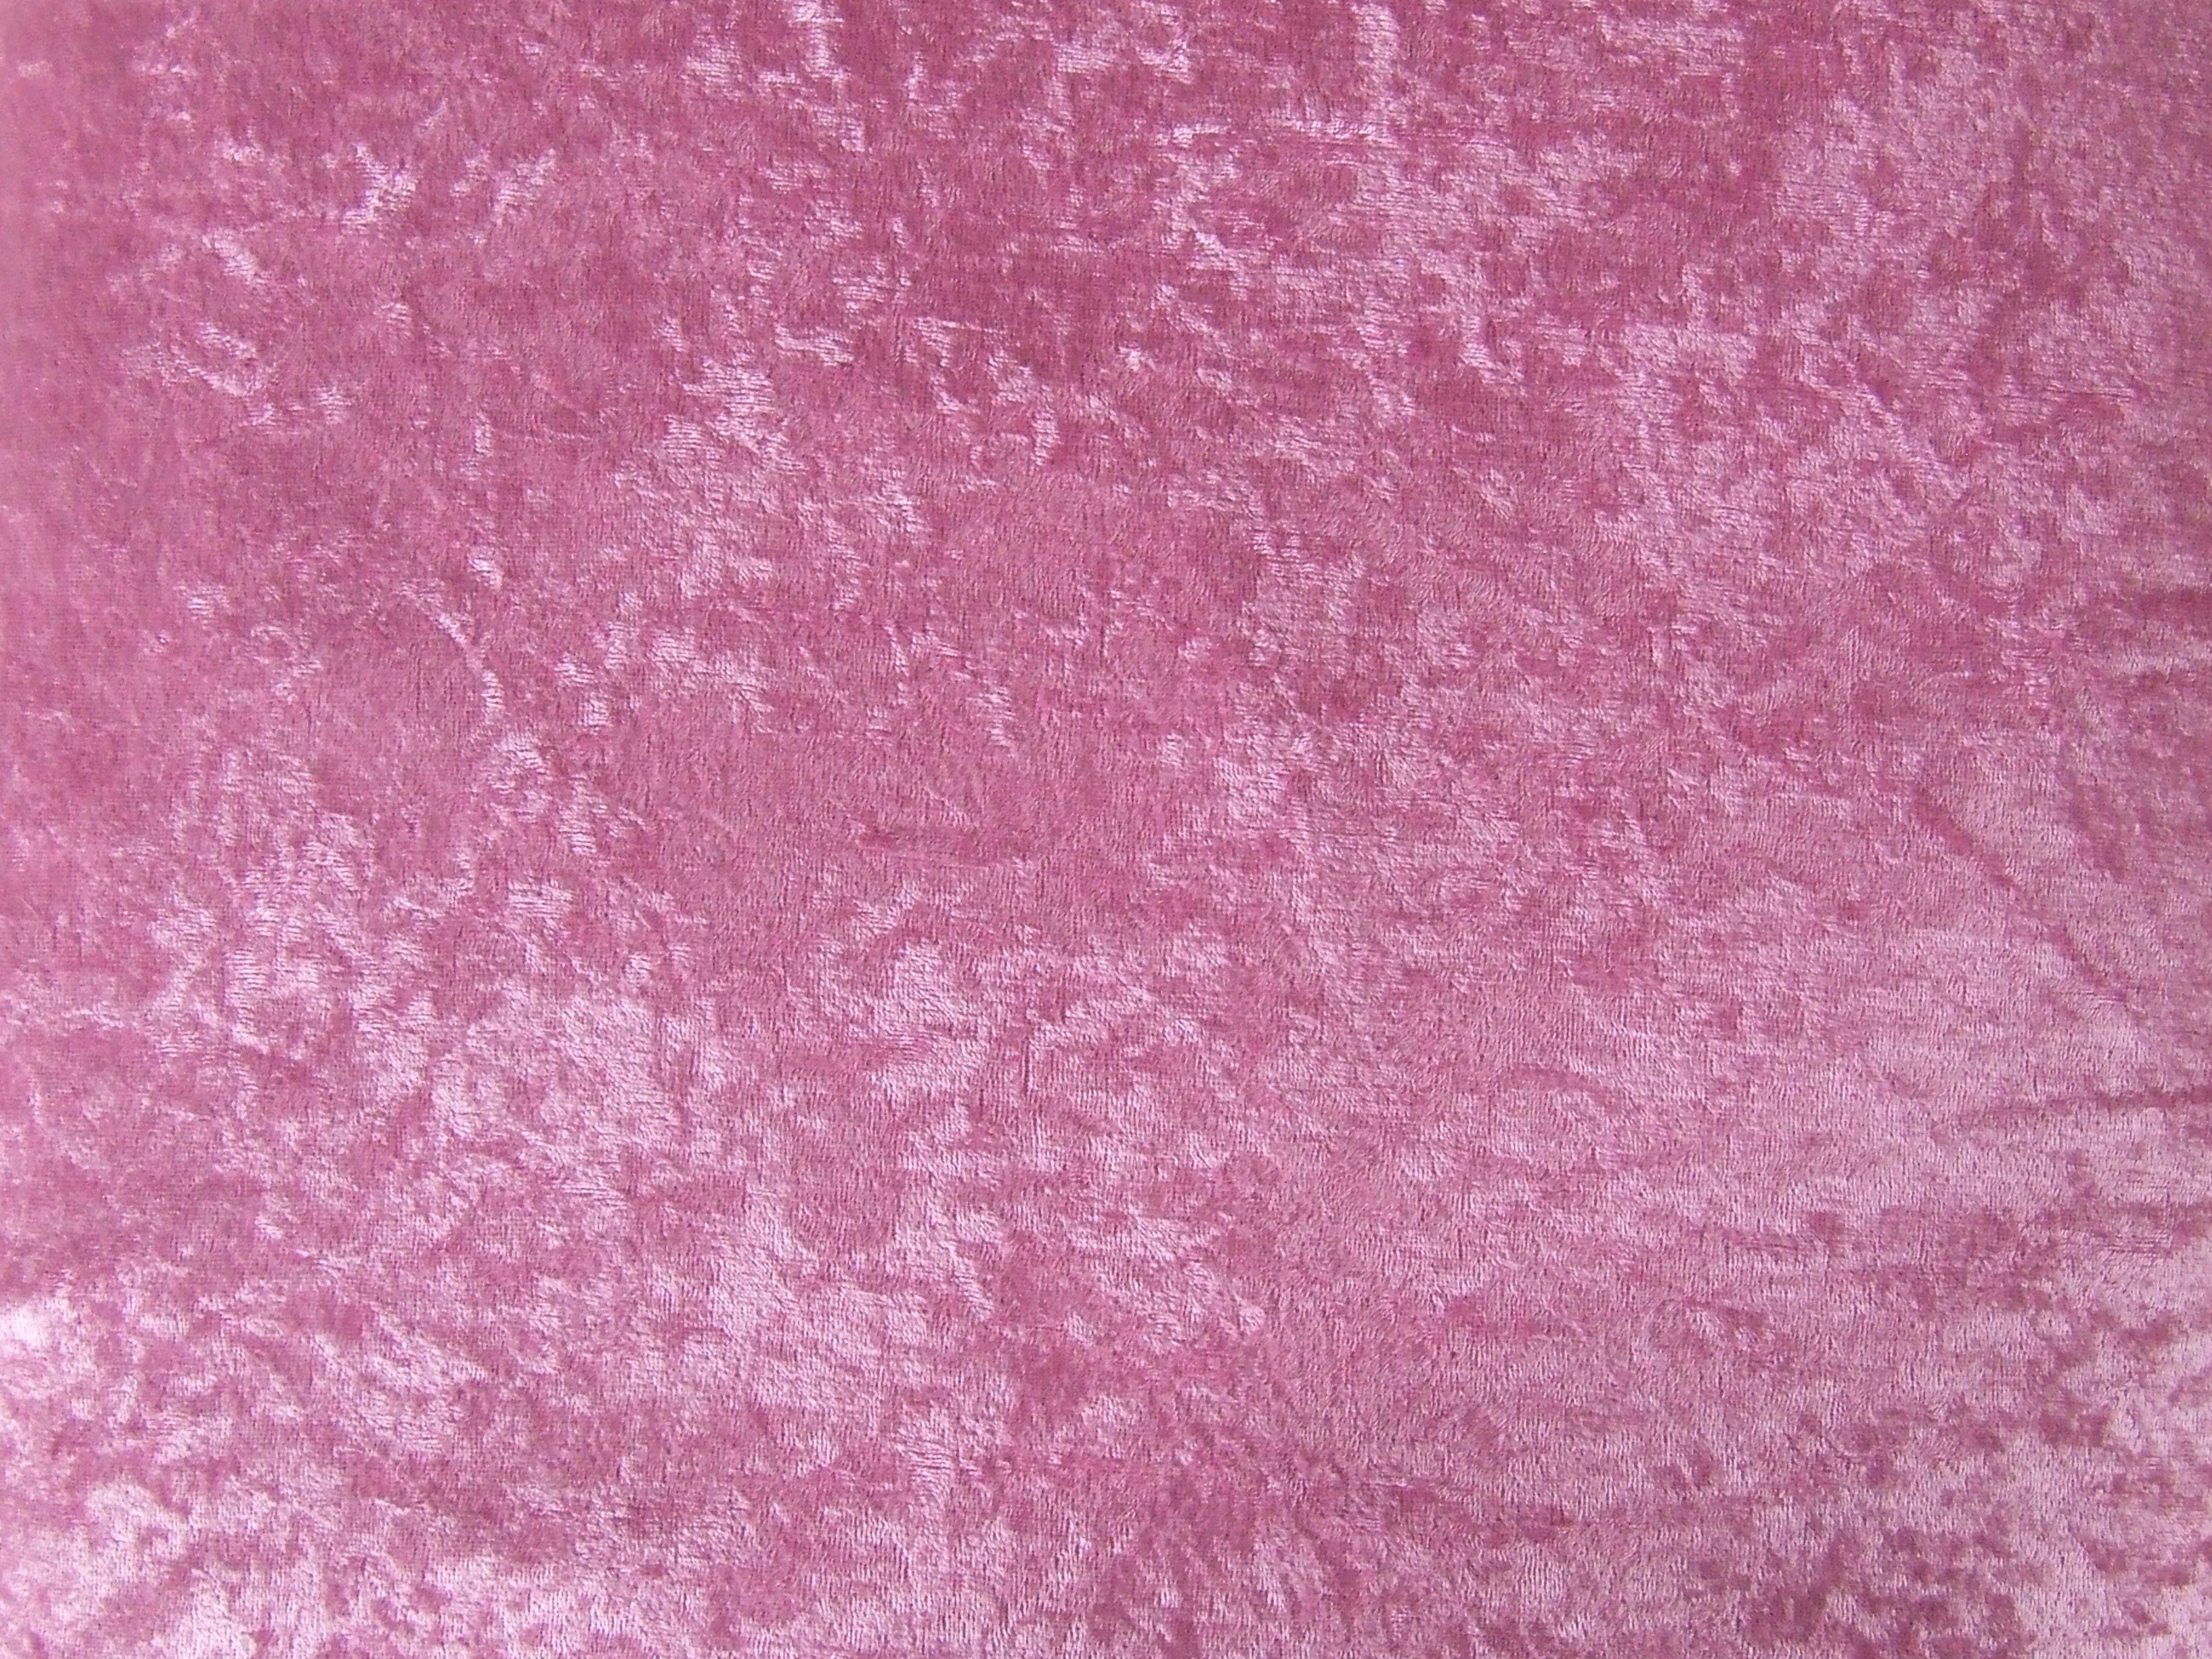 crushed velvet texture. Parée Erica Photography | Pink Crushed Velvet, 2008 Velvet Texture T